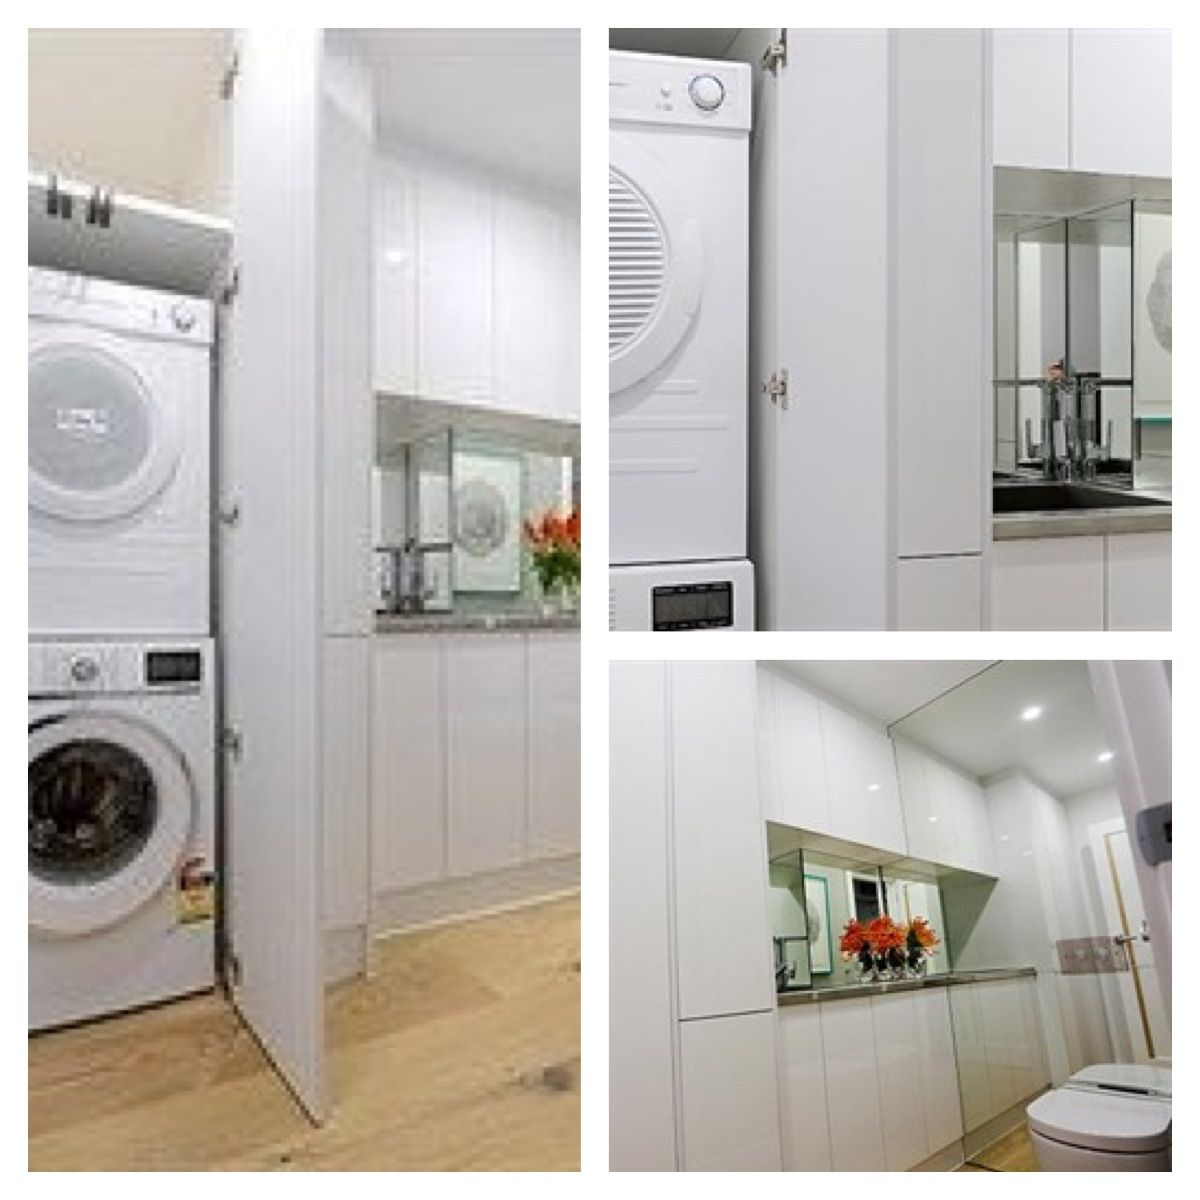 2013 The Block Ideas - Shared Bathroom/laundry